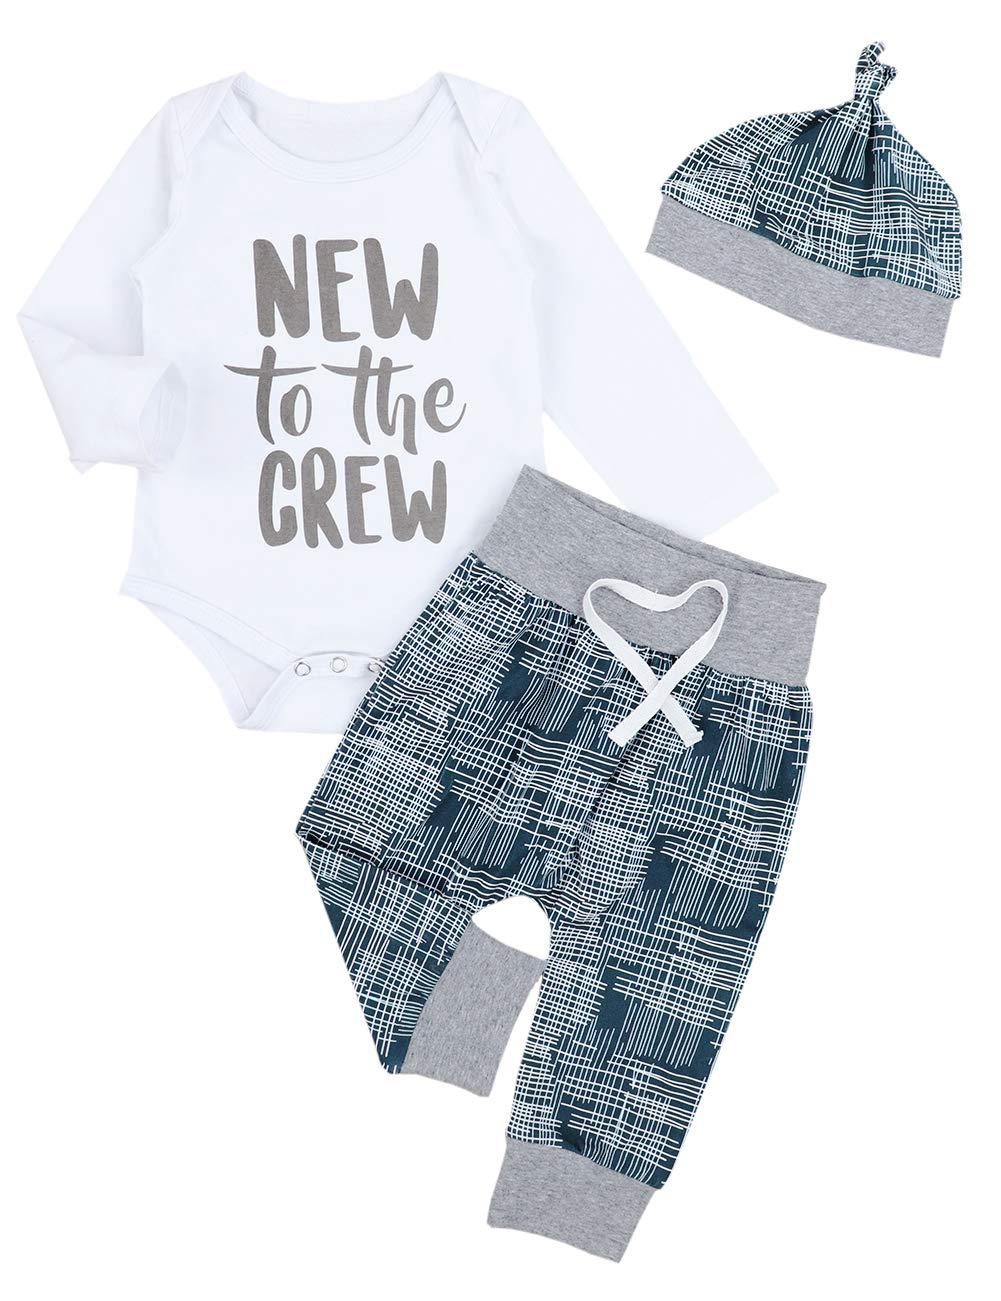 Newborn Baby Boy Girl Clothes Crew Letter Print Romper+Long Pants+Hat 3PCS Outfits Set (3-6M)